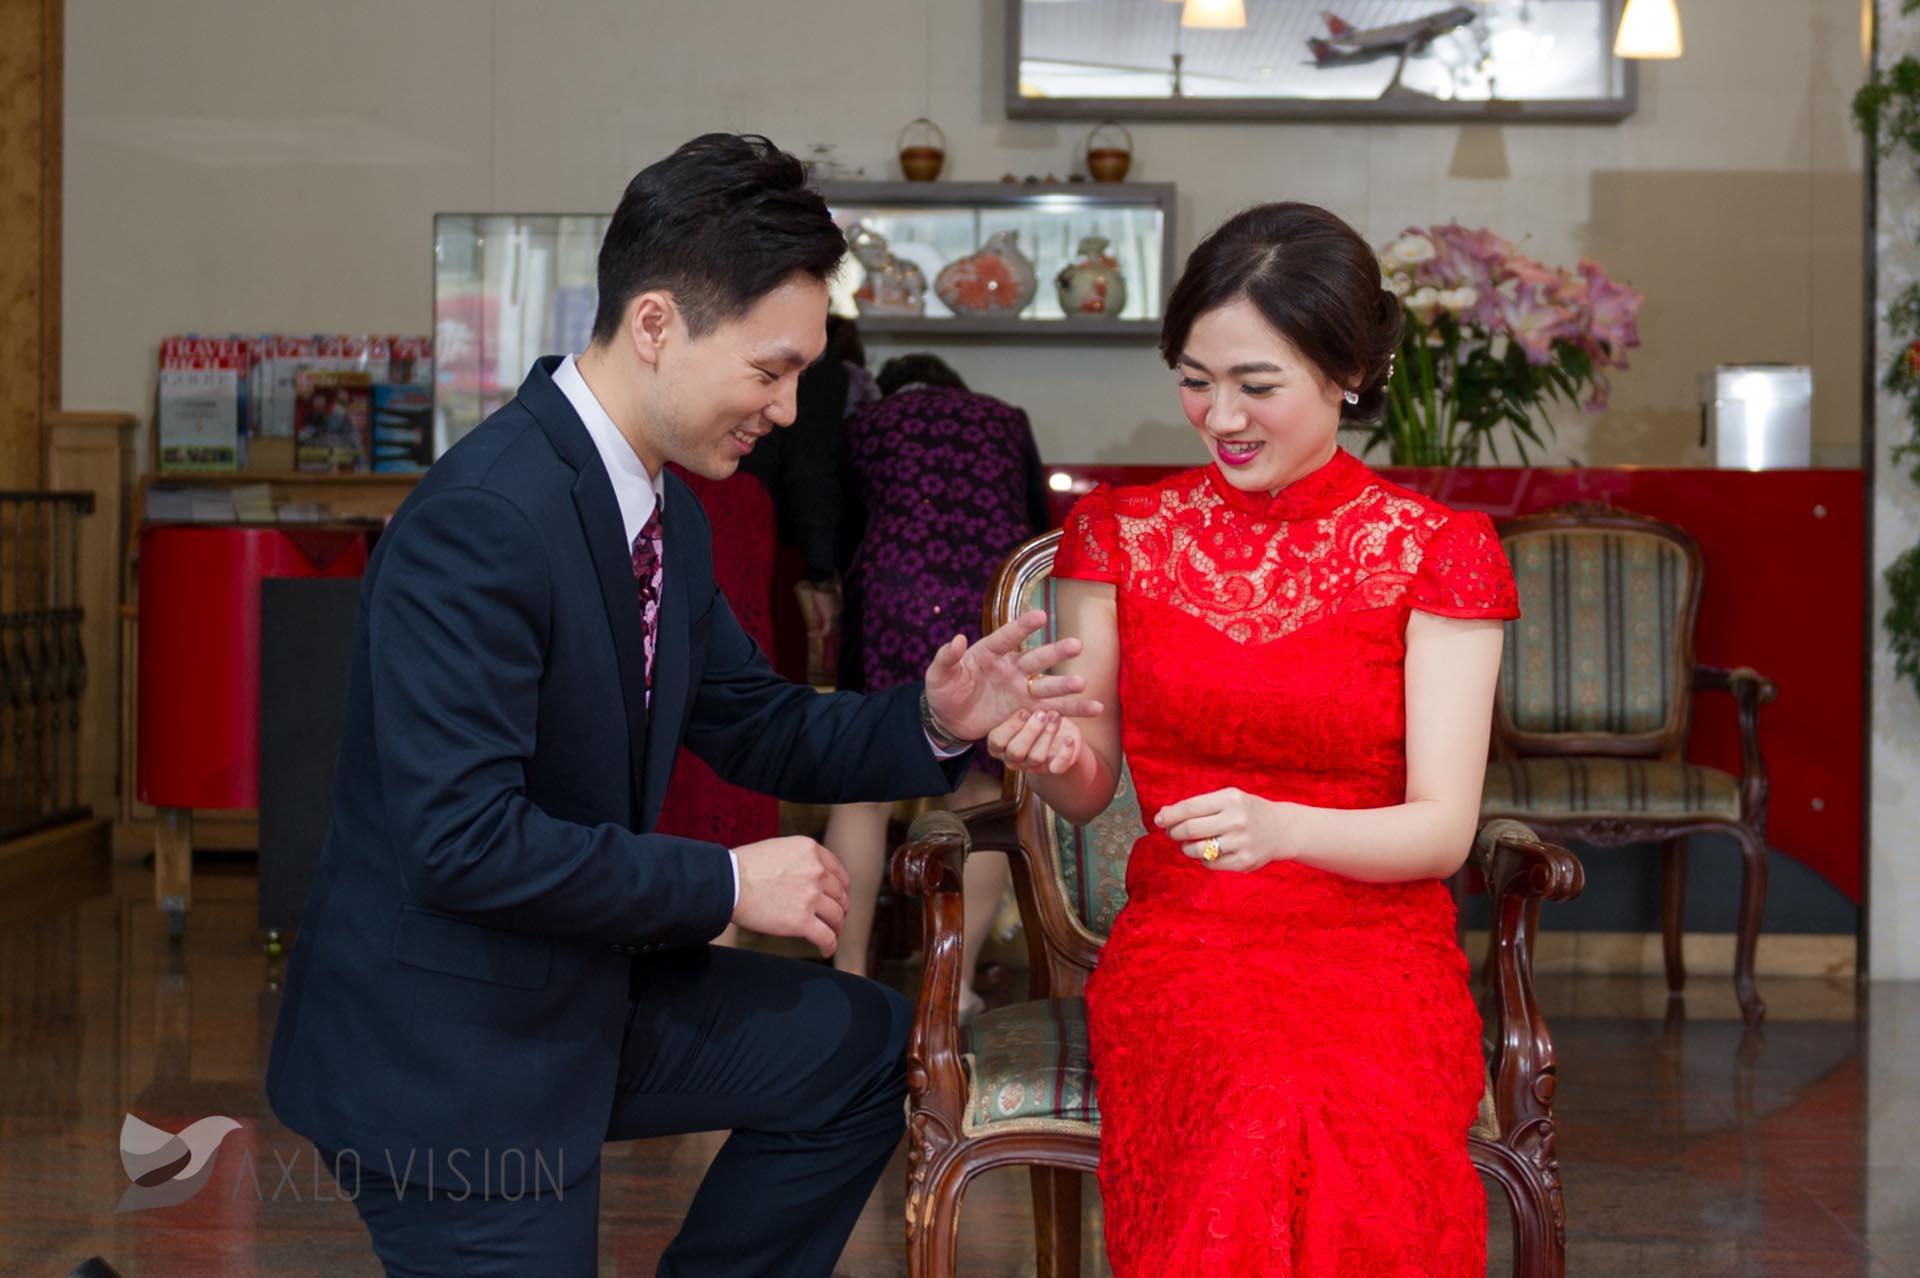 WeddingDay20170401A_055